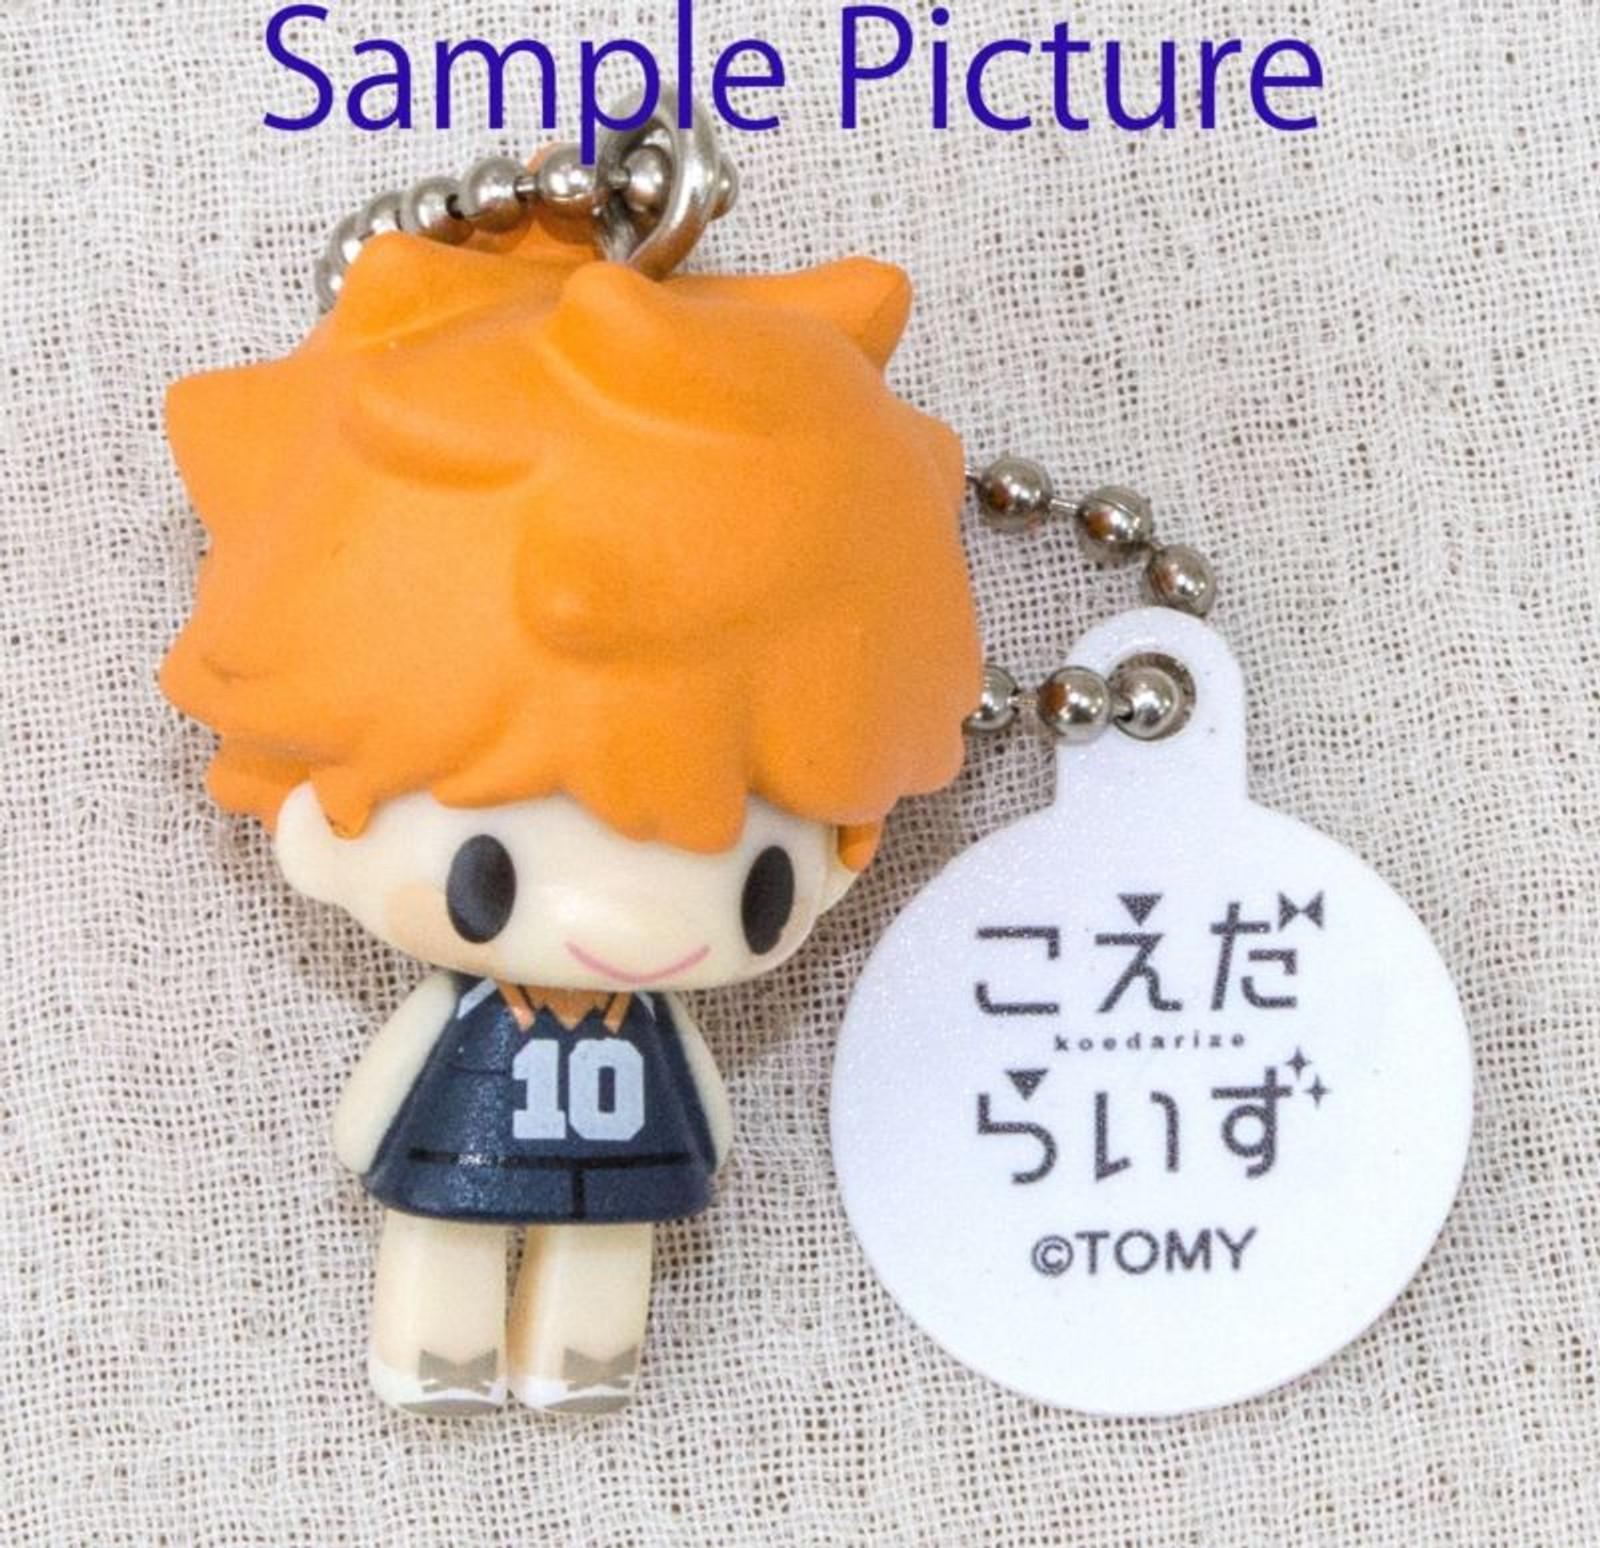 Haikyu!! Koedarize Mascot Figure Strap Shoyo Hinata Ver. Takara JAPAN ANIME